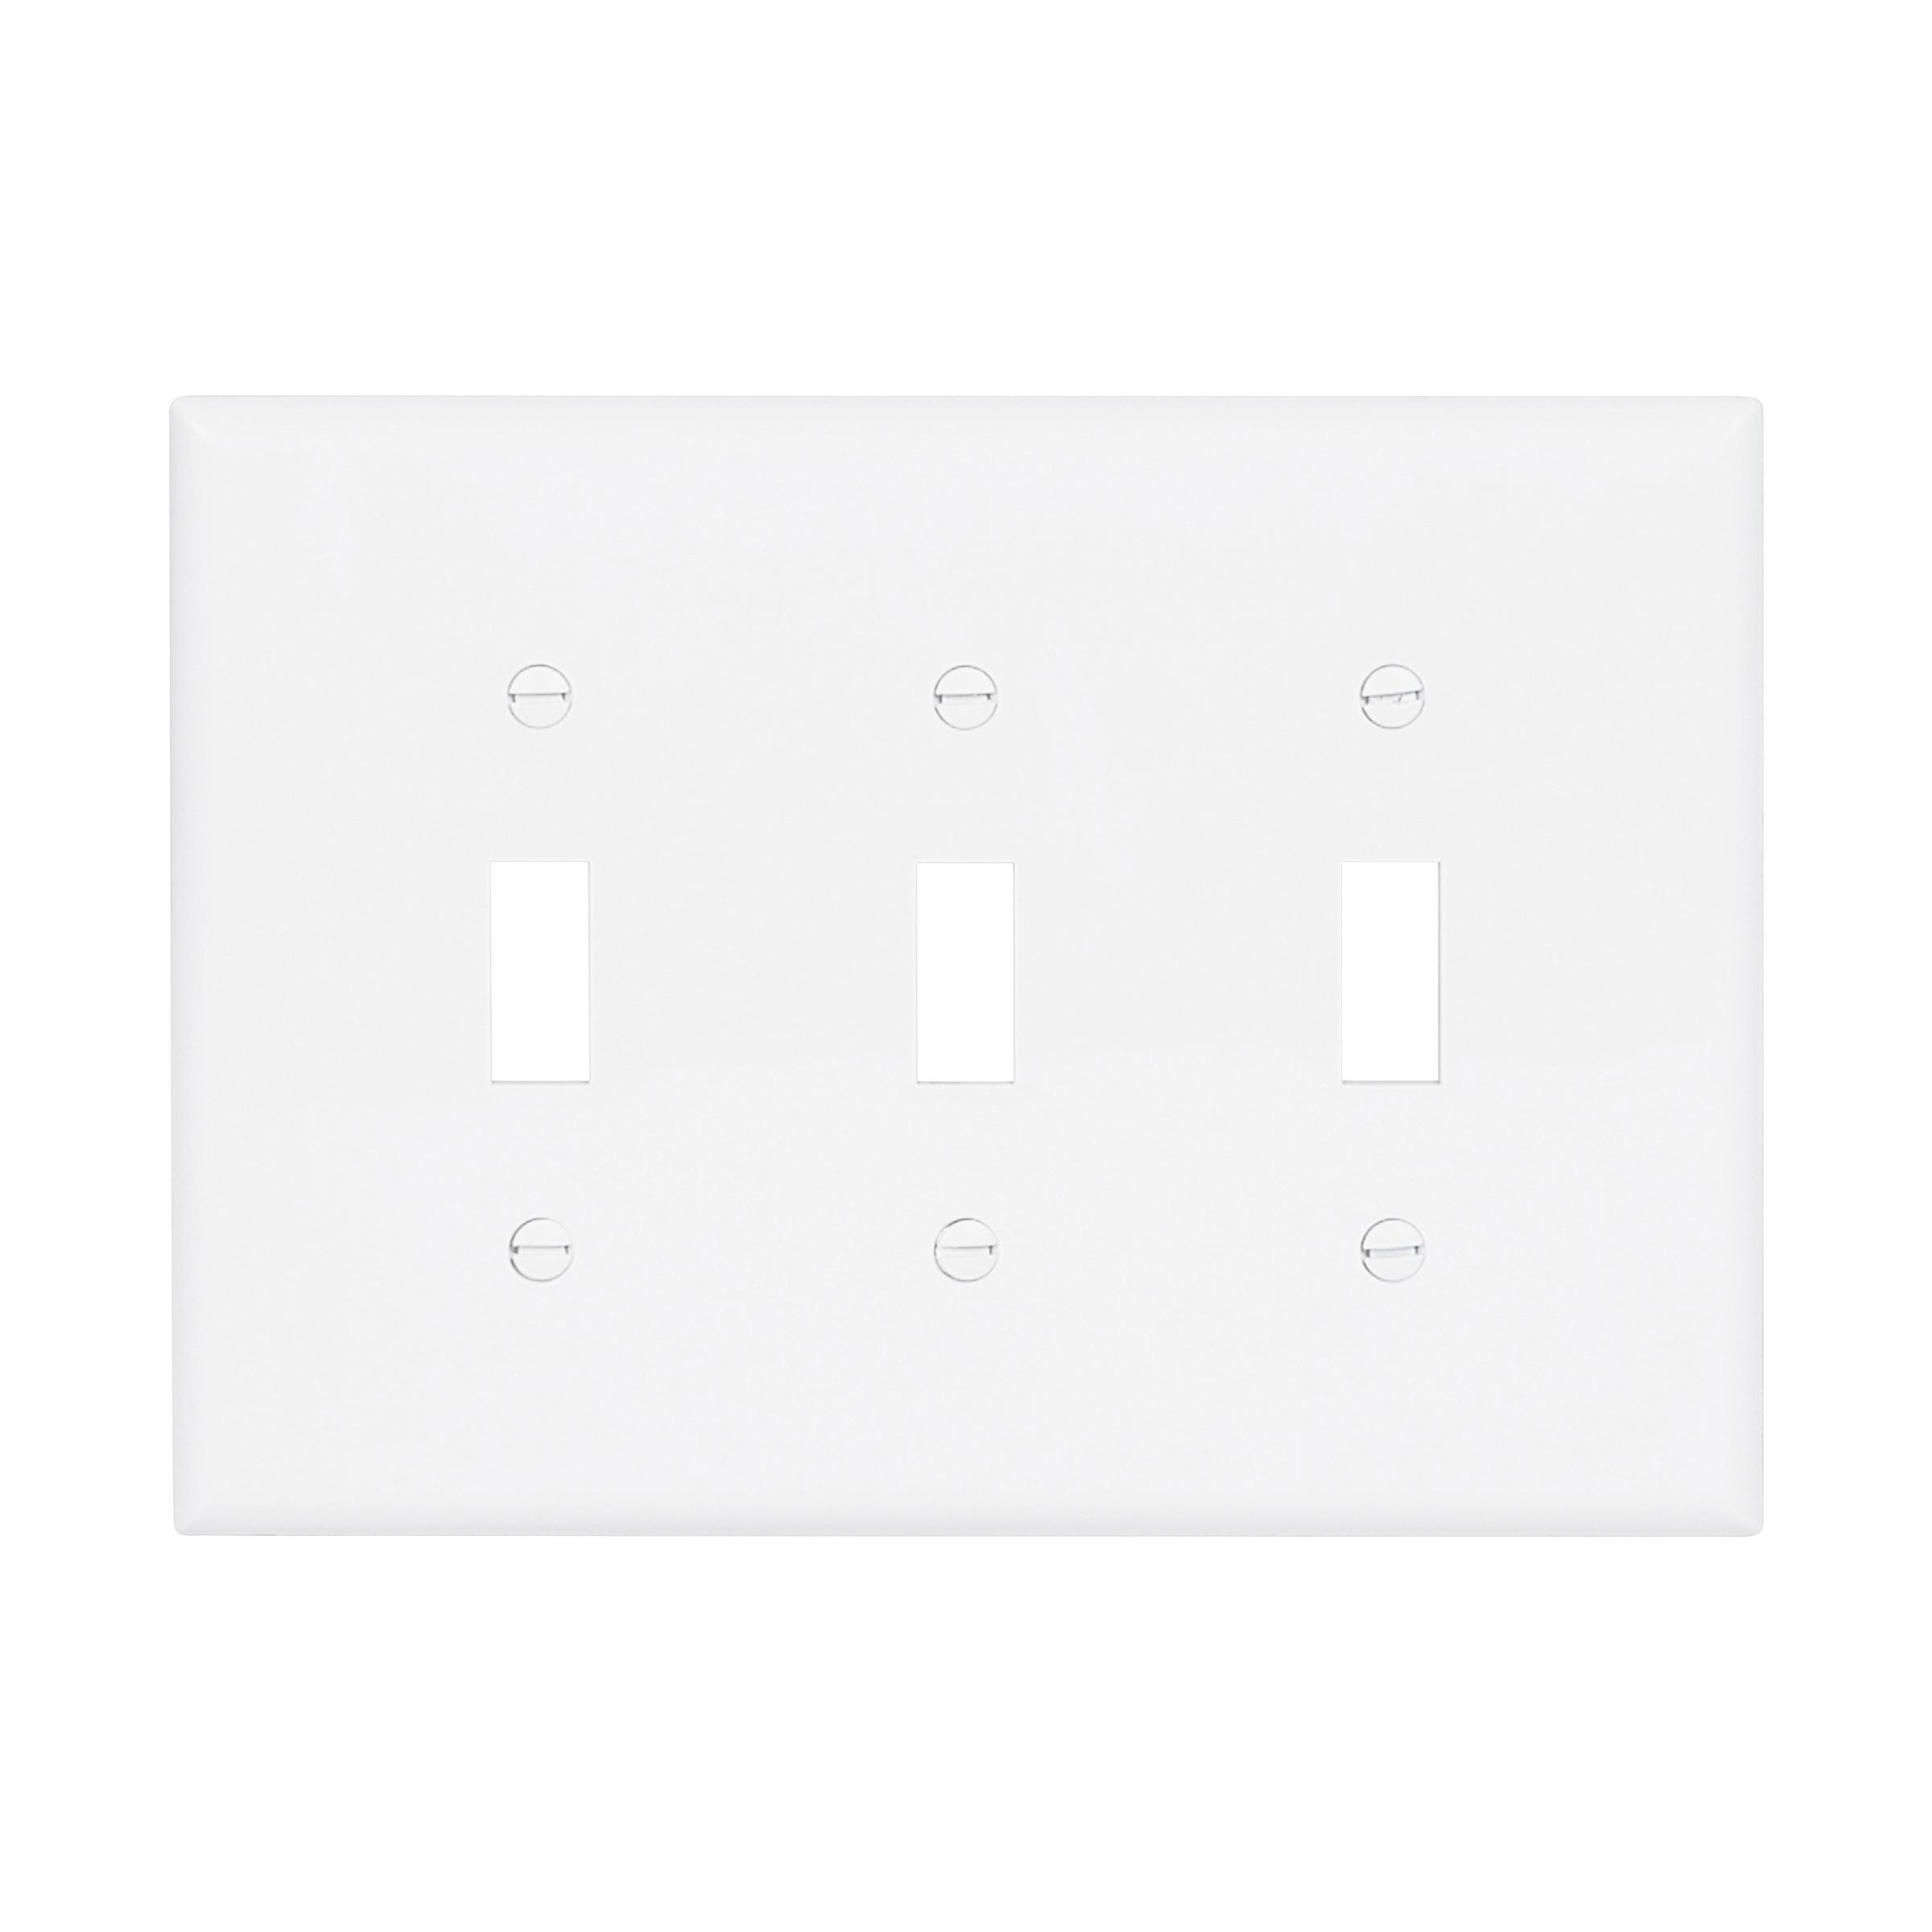 Mid-size Toggle Switch Wallplate (EAT PJ3W 3G NYLON MIDSIZE SWITCH)